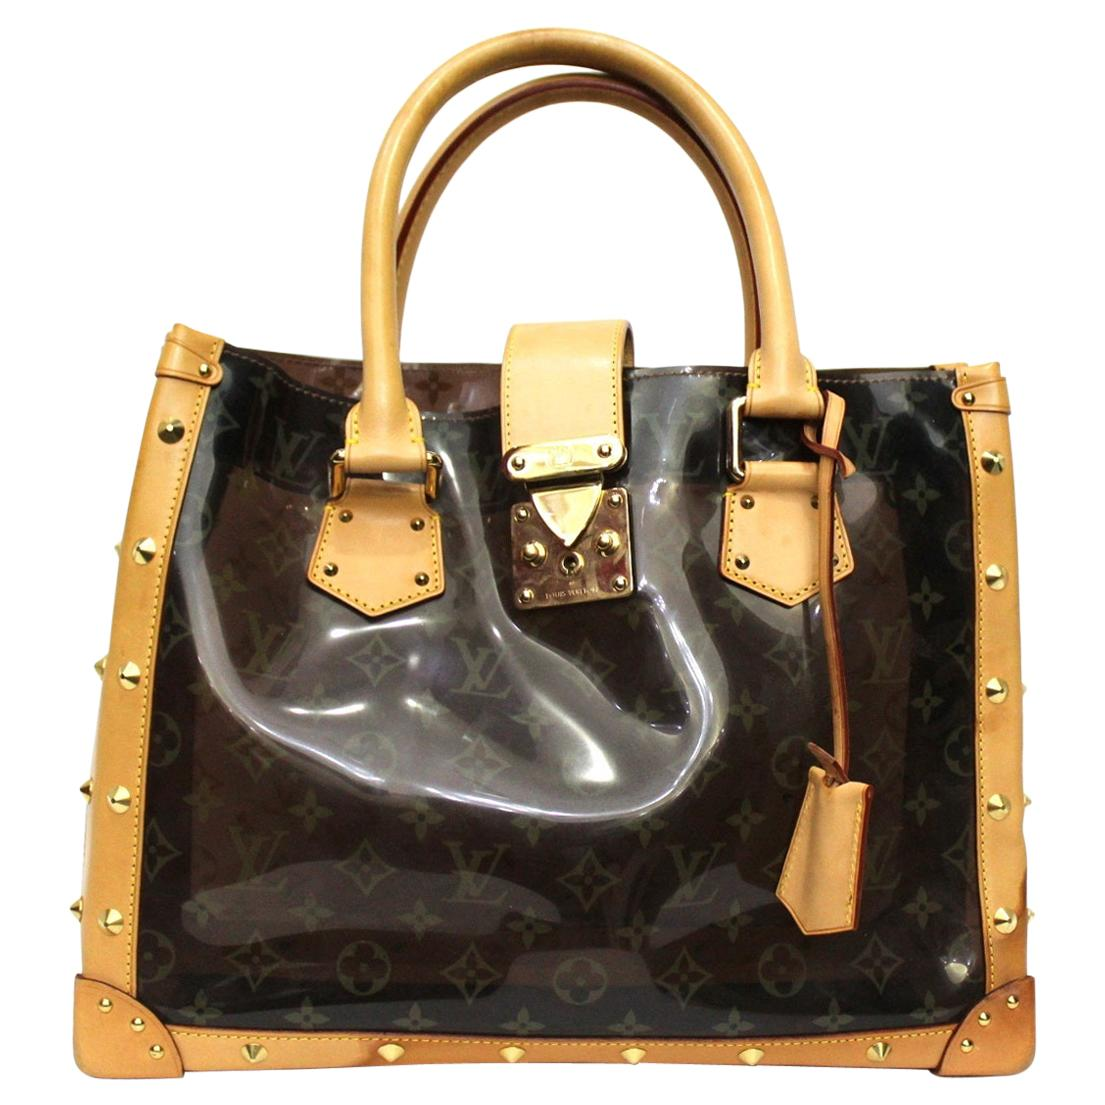 Louis Vuitton Limited Edition Vinyl Monogram Ambre Neo Cabas Cruise Bag